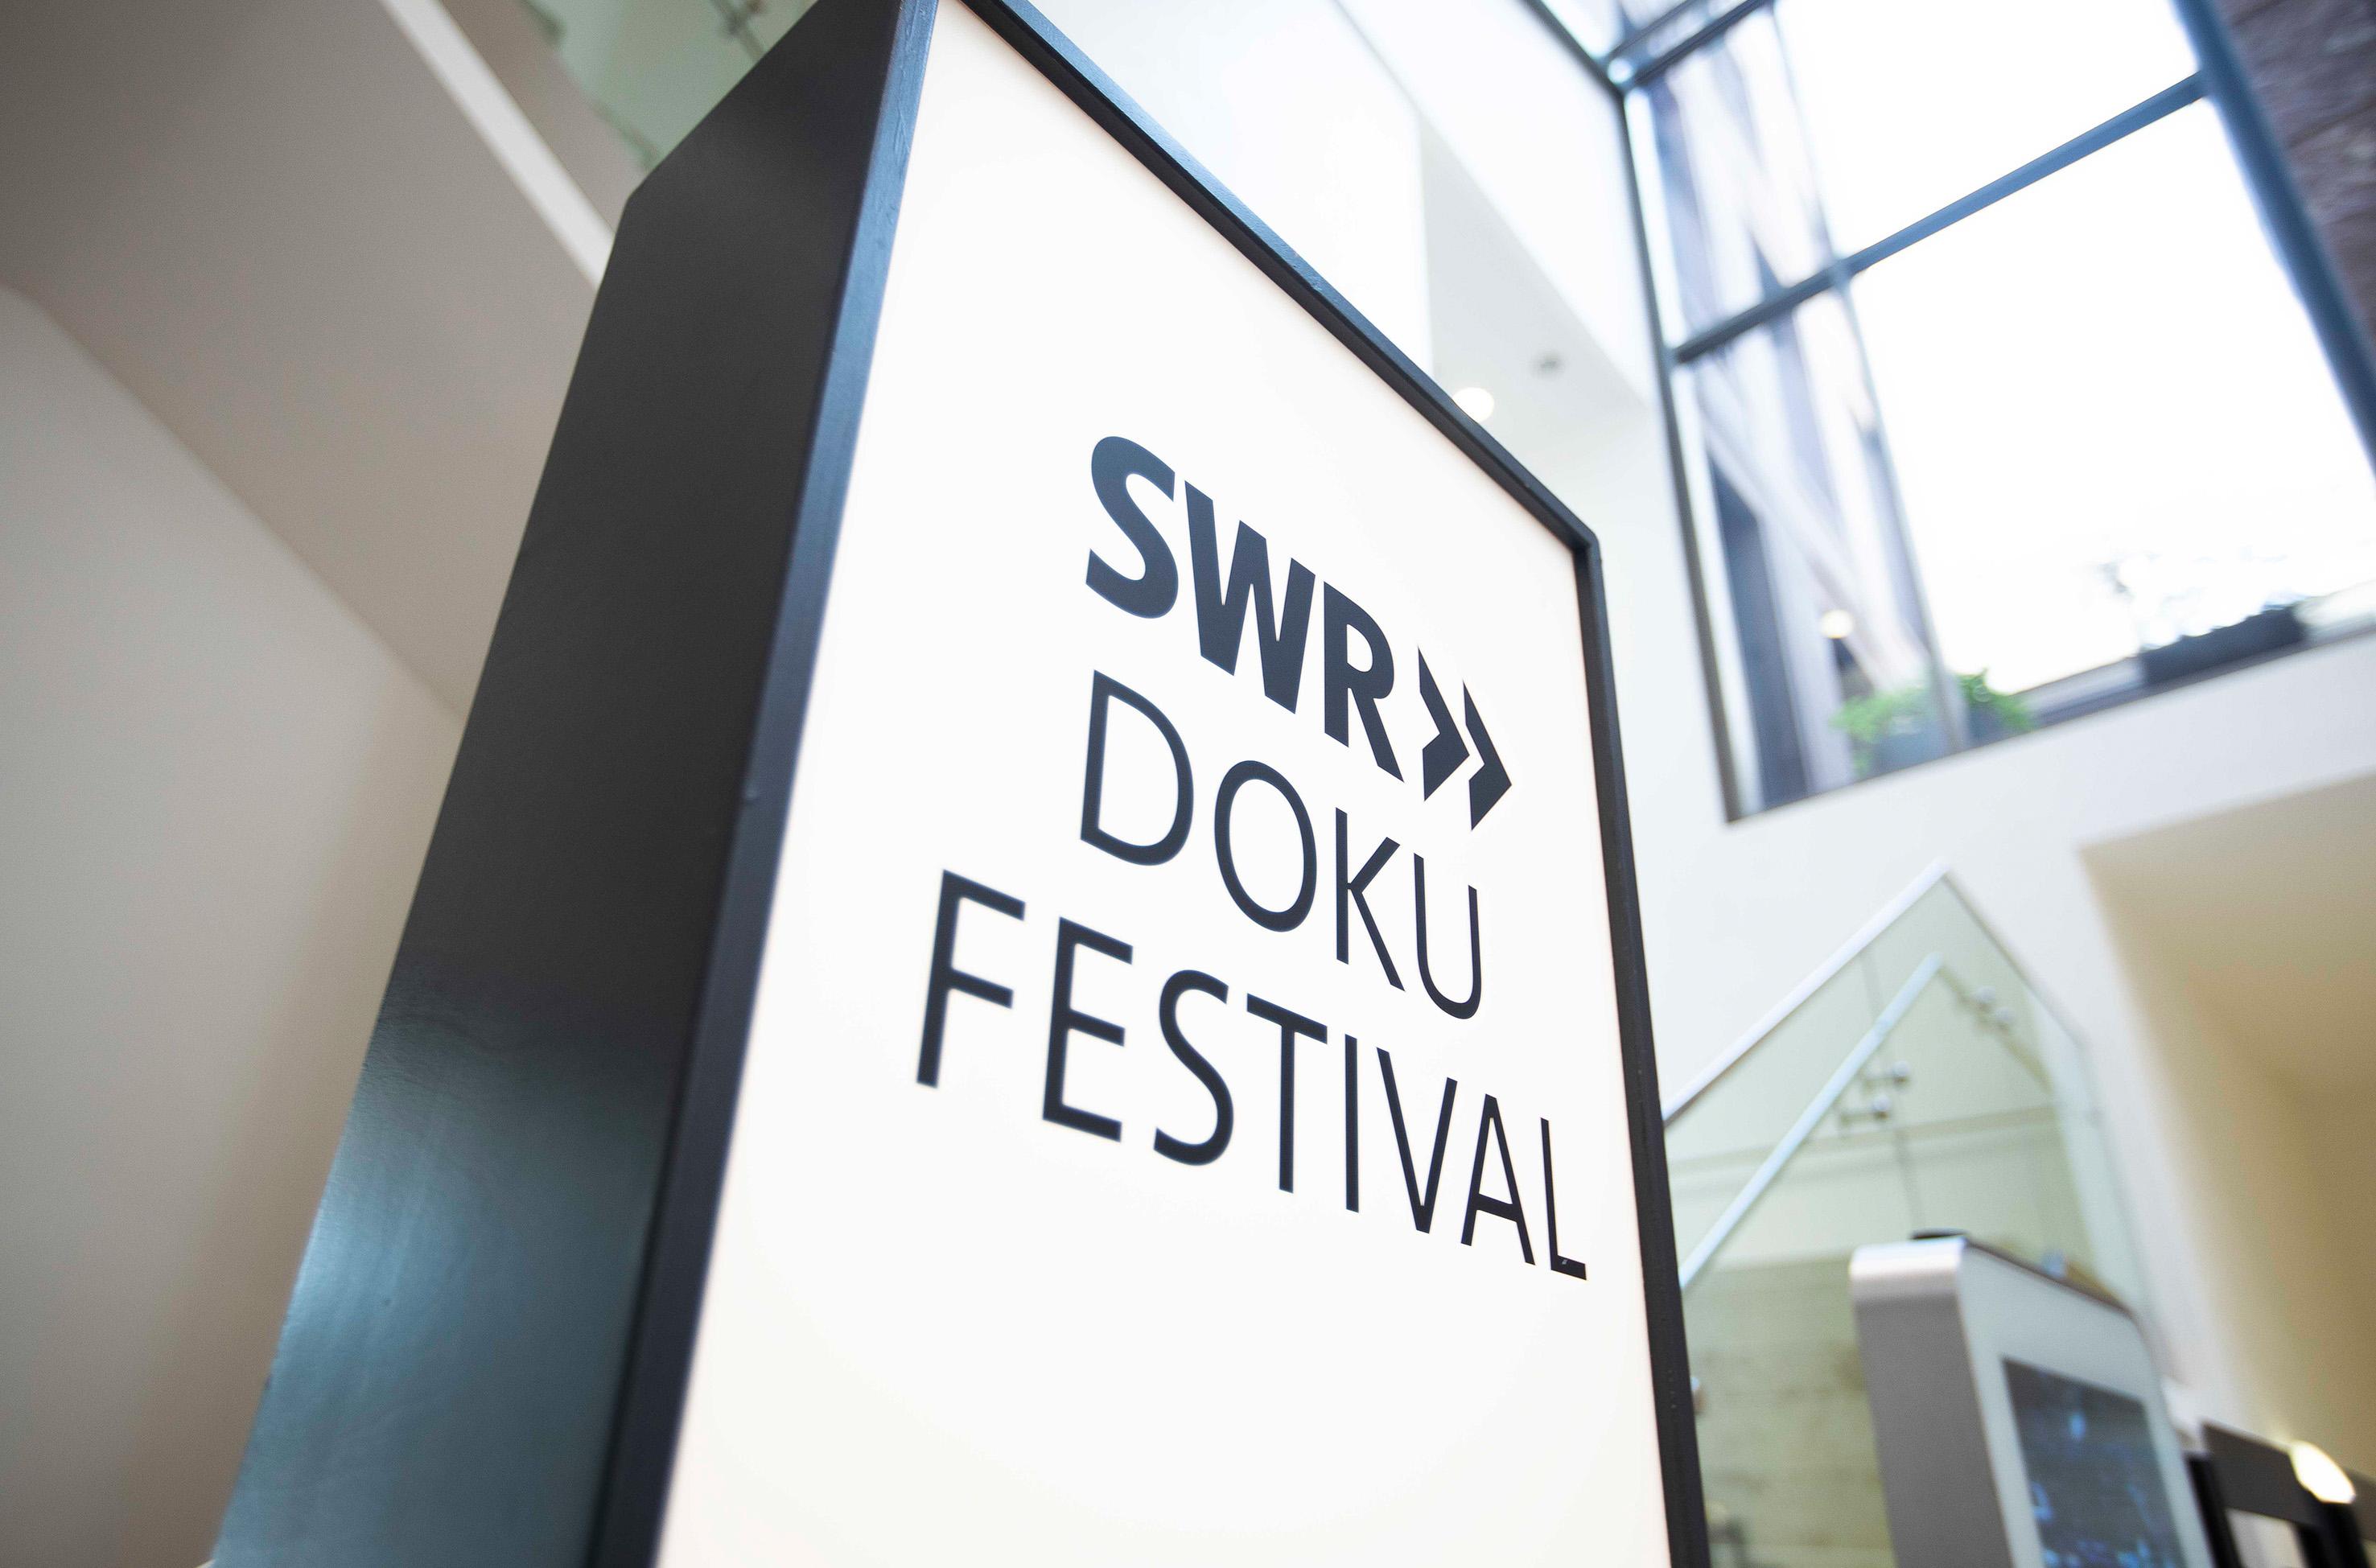 SWR Doku Festival 2020 #digital